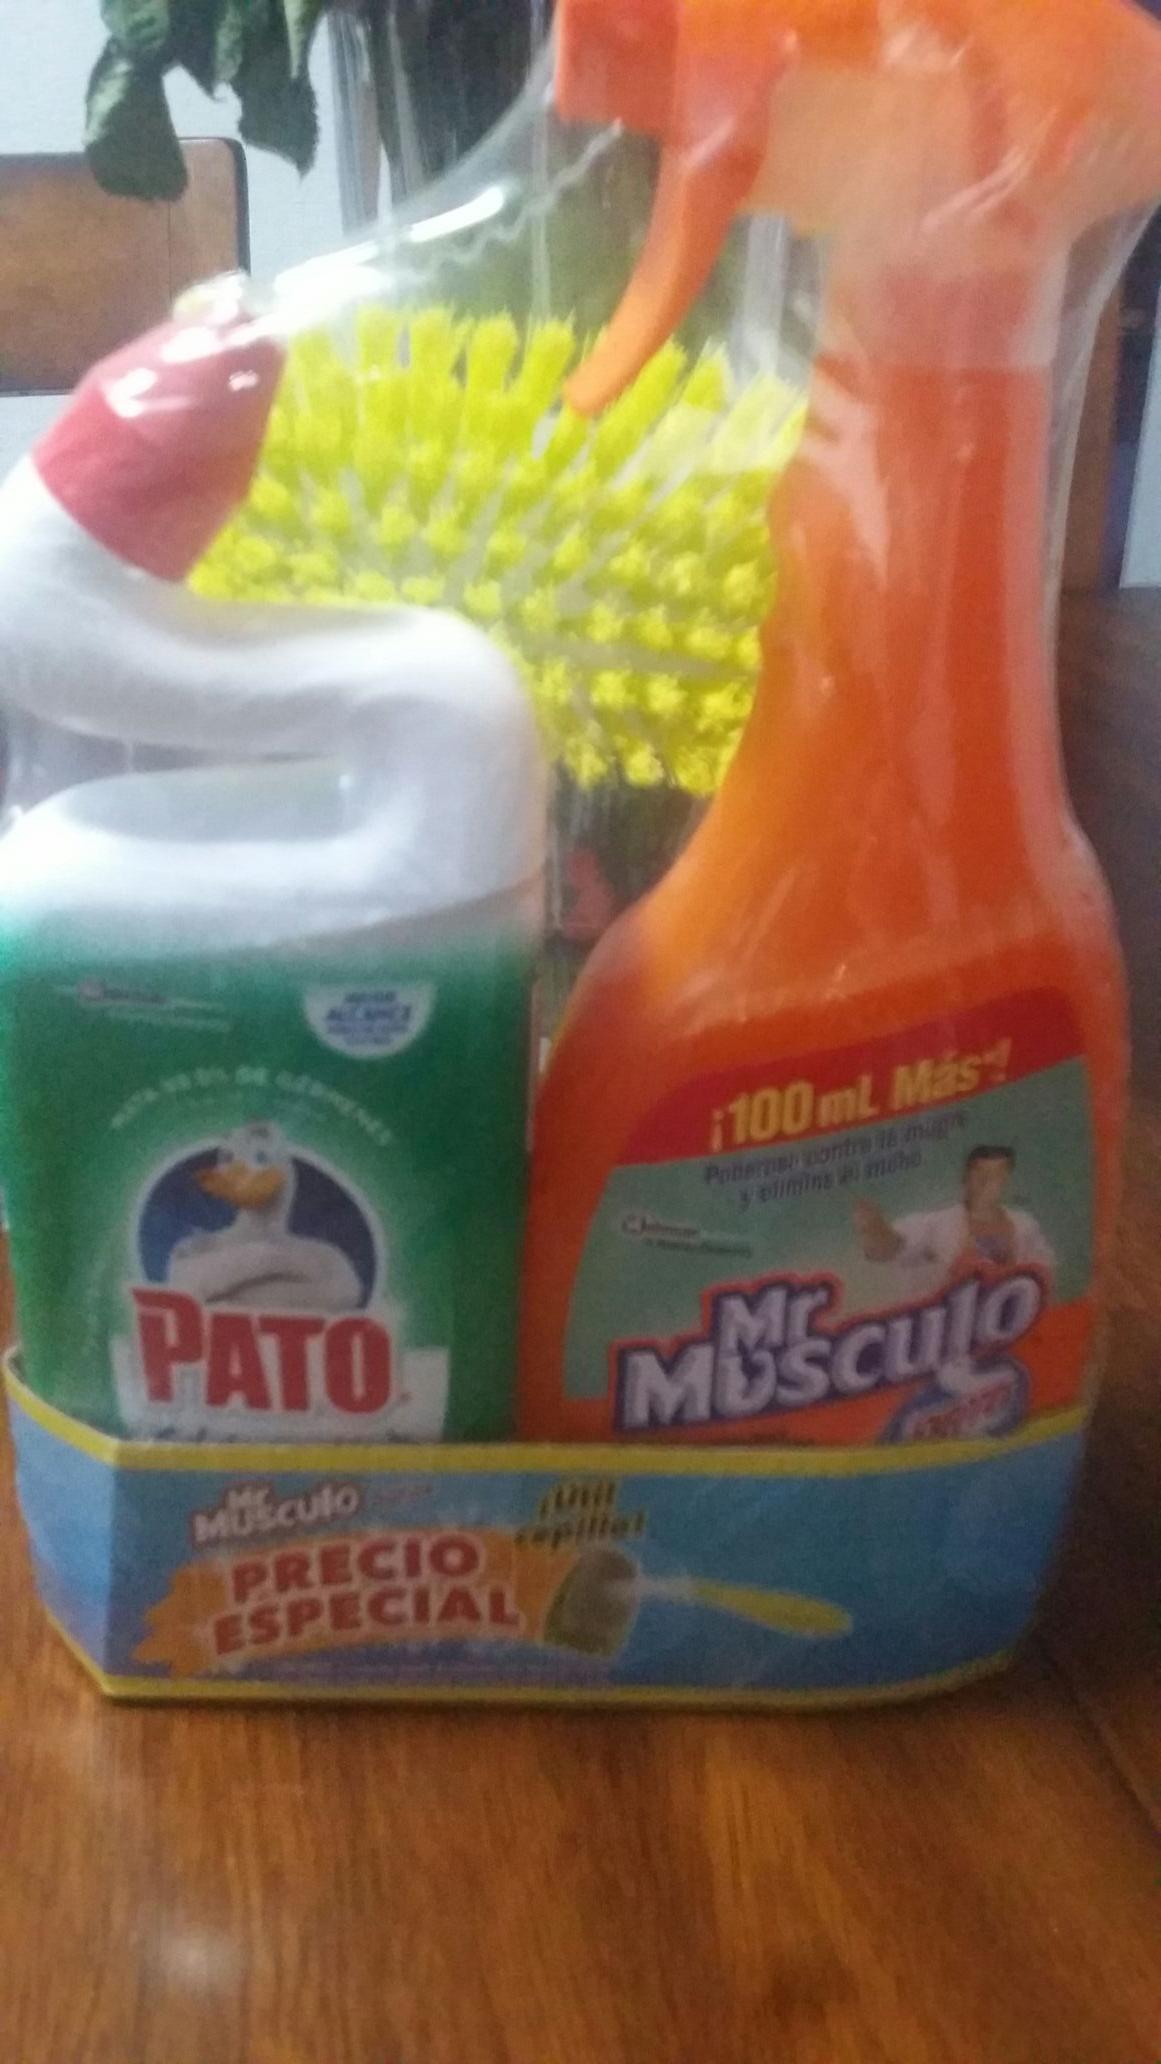 Walmart: Mr musculo y pato purific